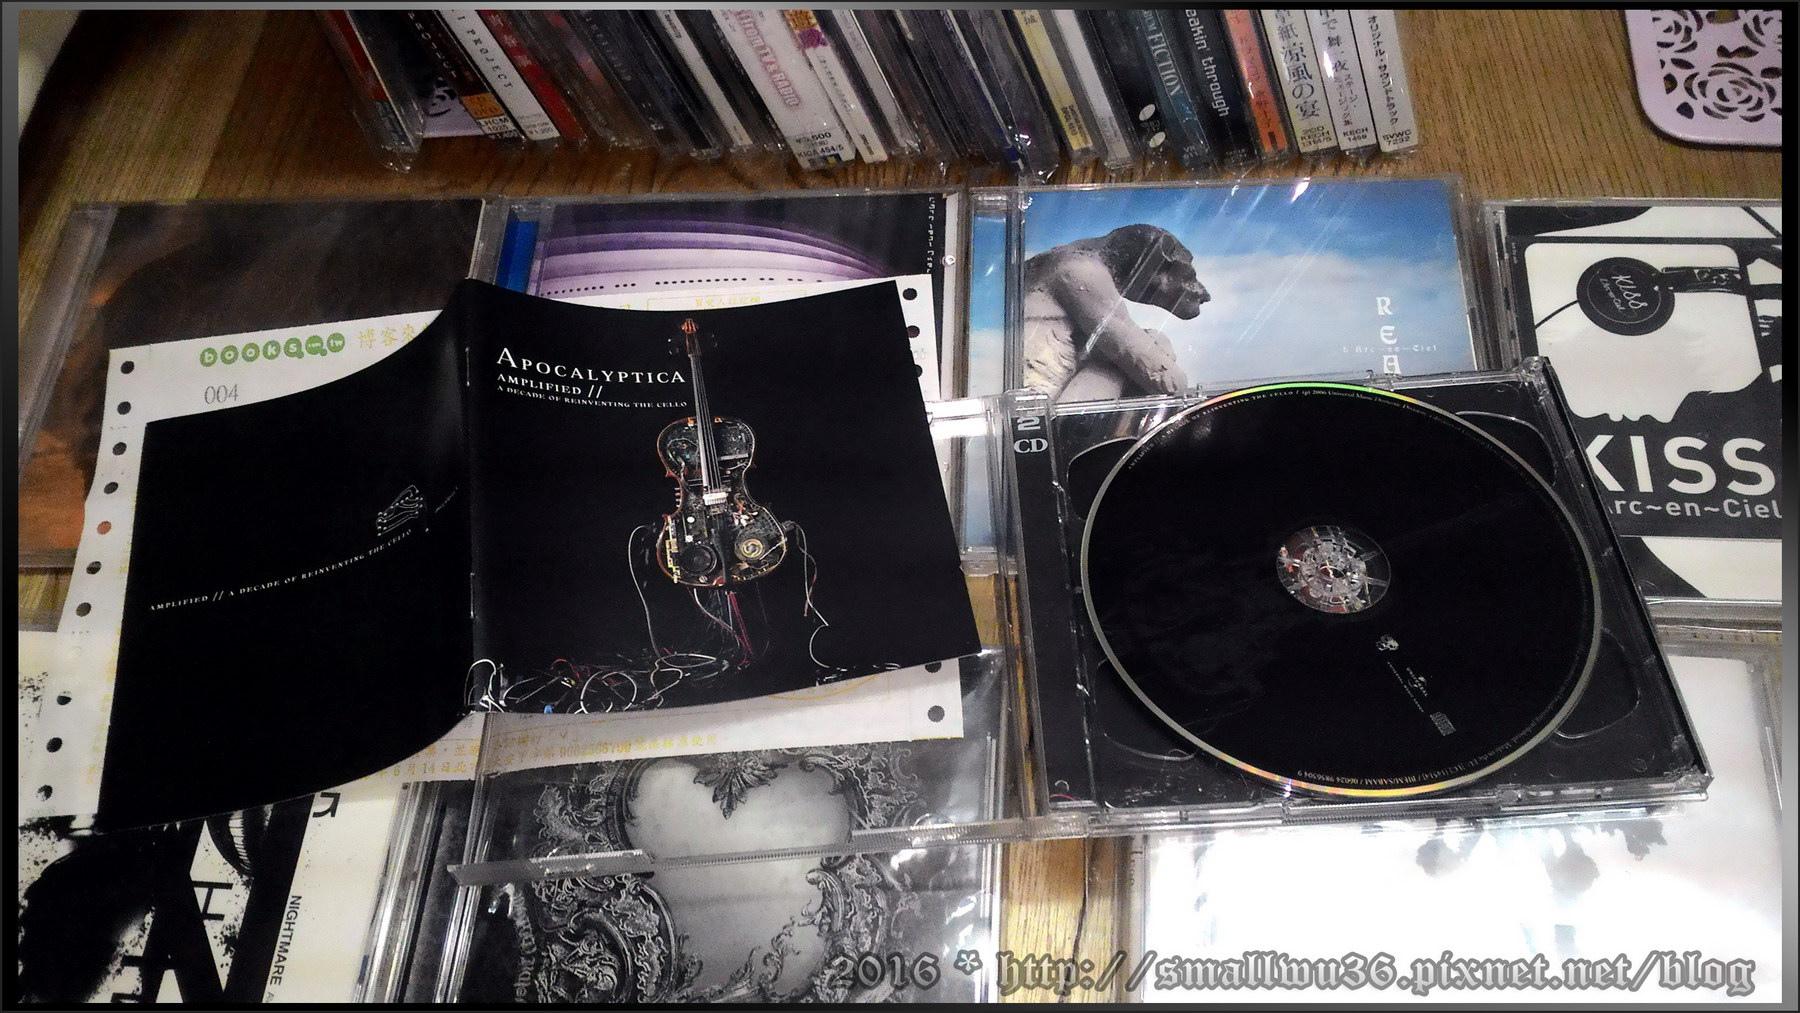 Apocalyptica (金屬啟示錄) - A Decade Of Reinventing The Cello 十年精選.jpg